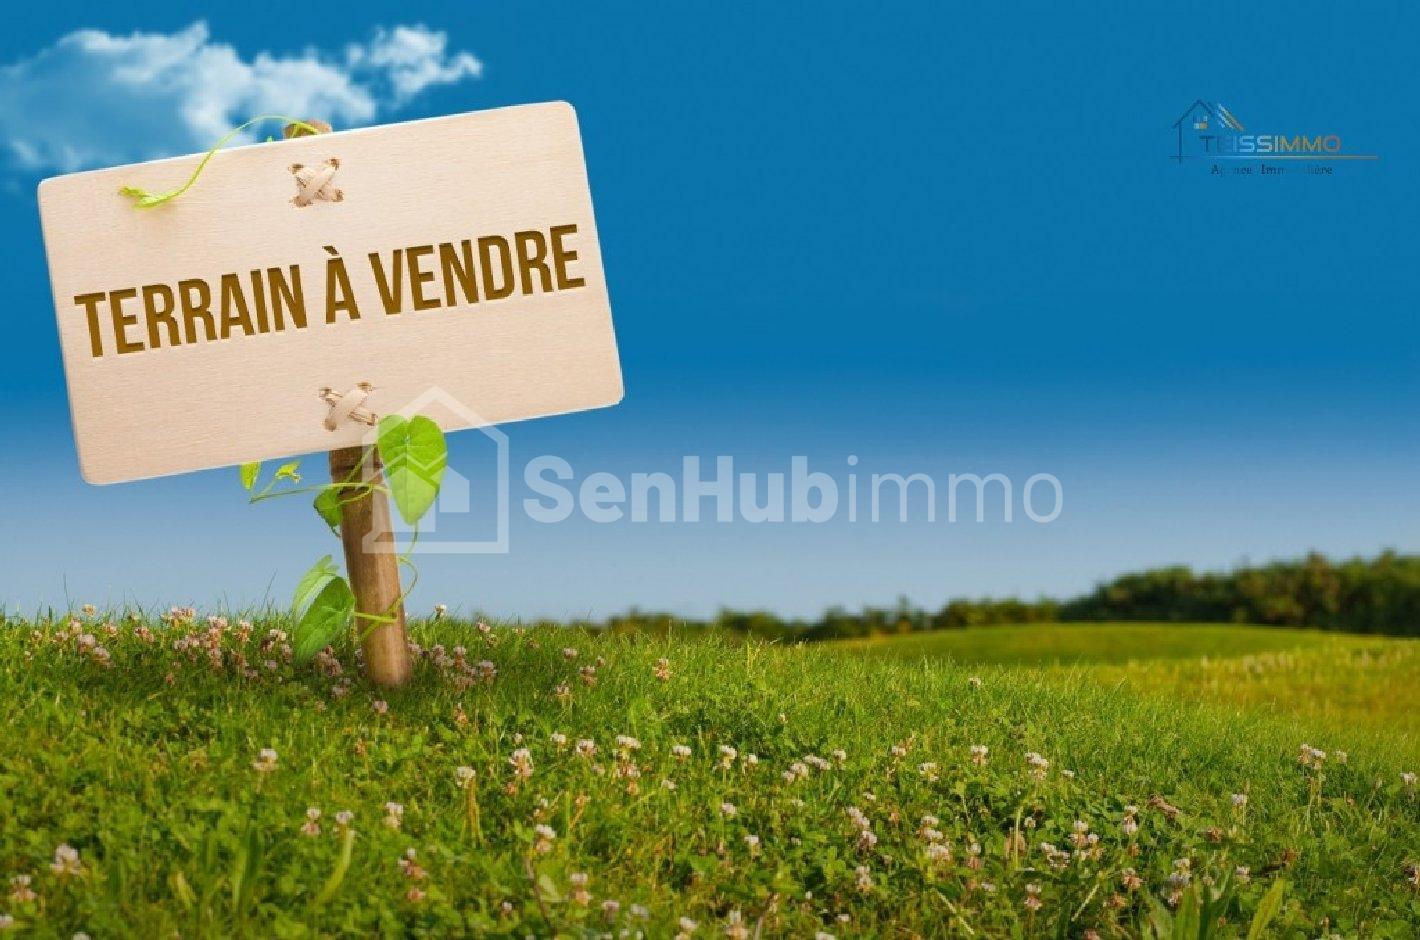 Terrain a vendre Saly - SenhubImmo.com